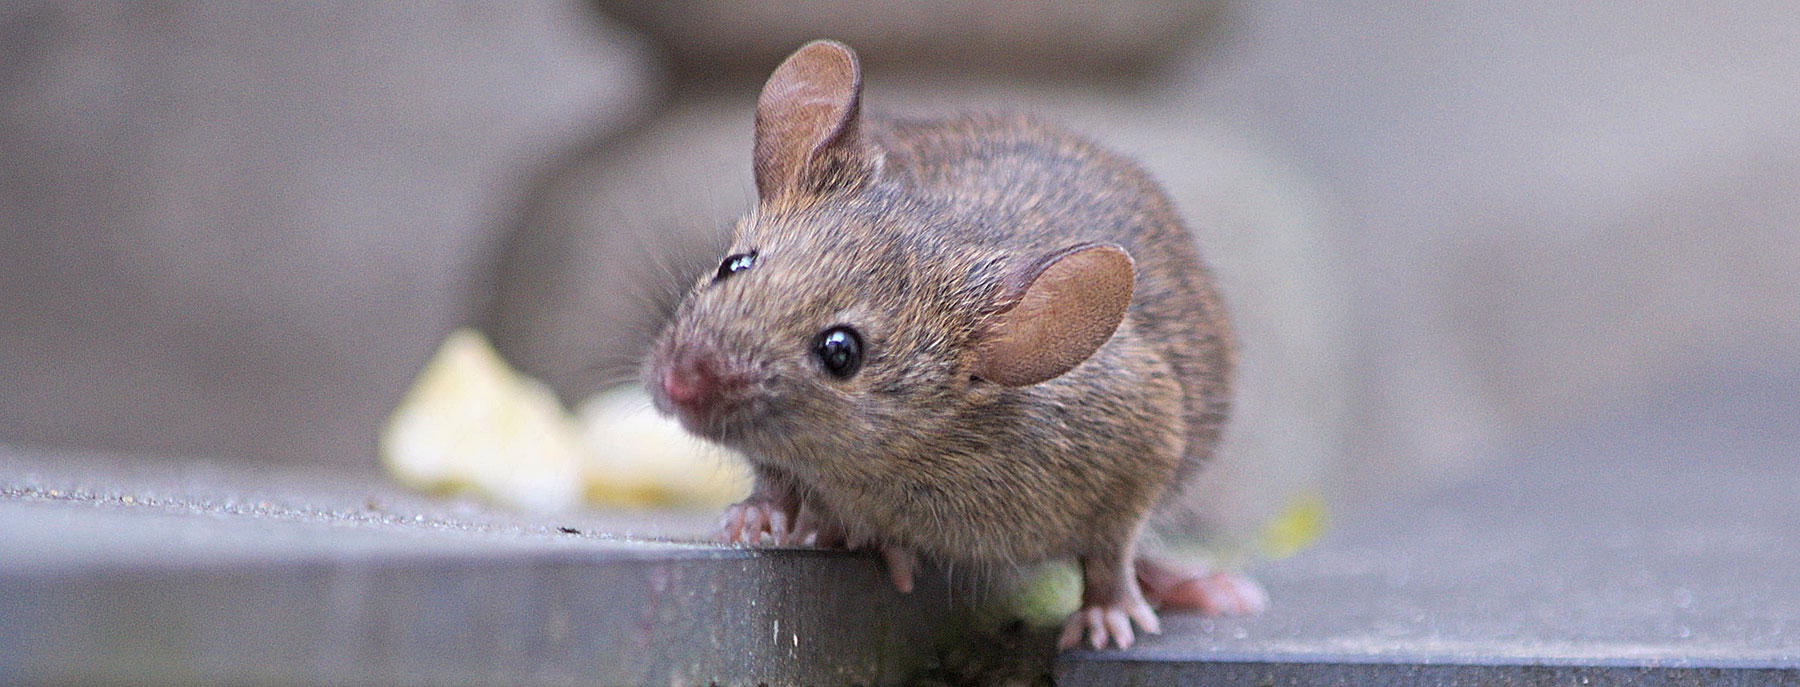 rats and mice oregon department of fish u0026 wildlife